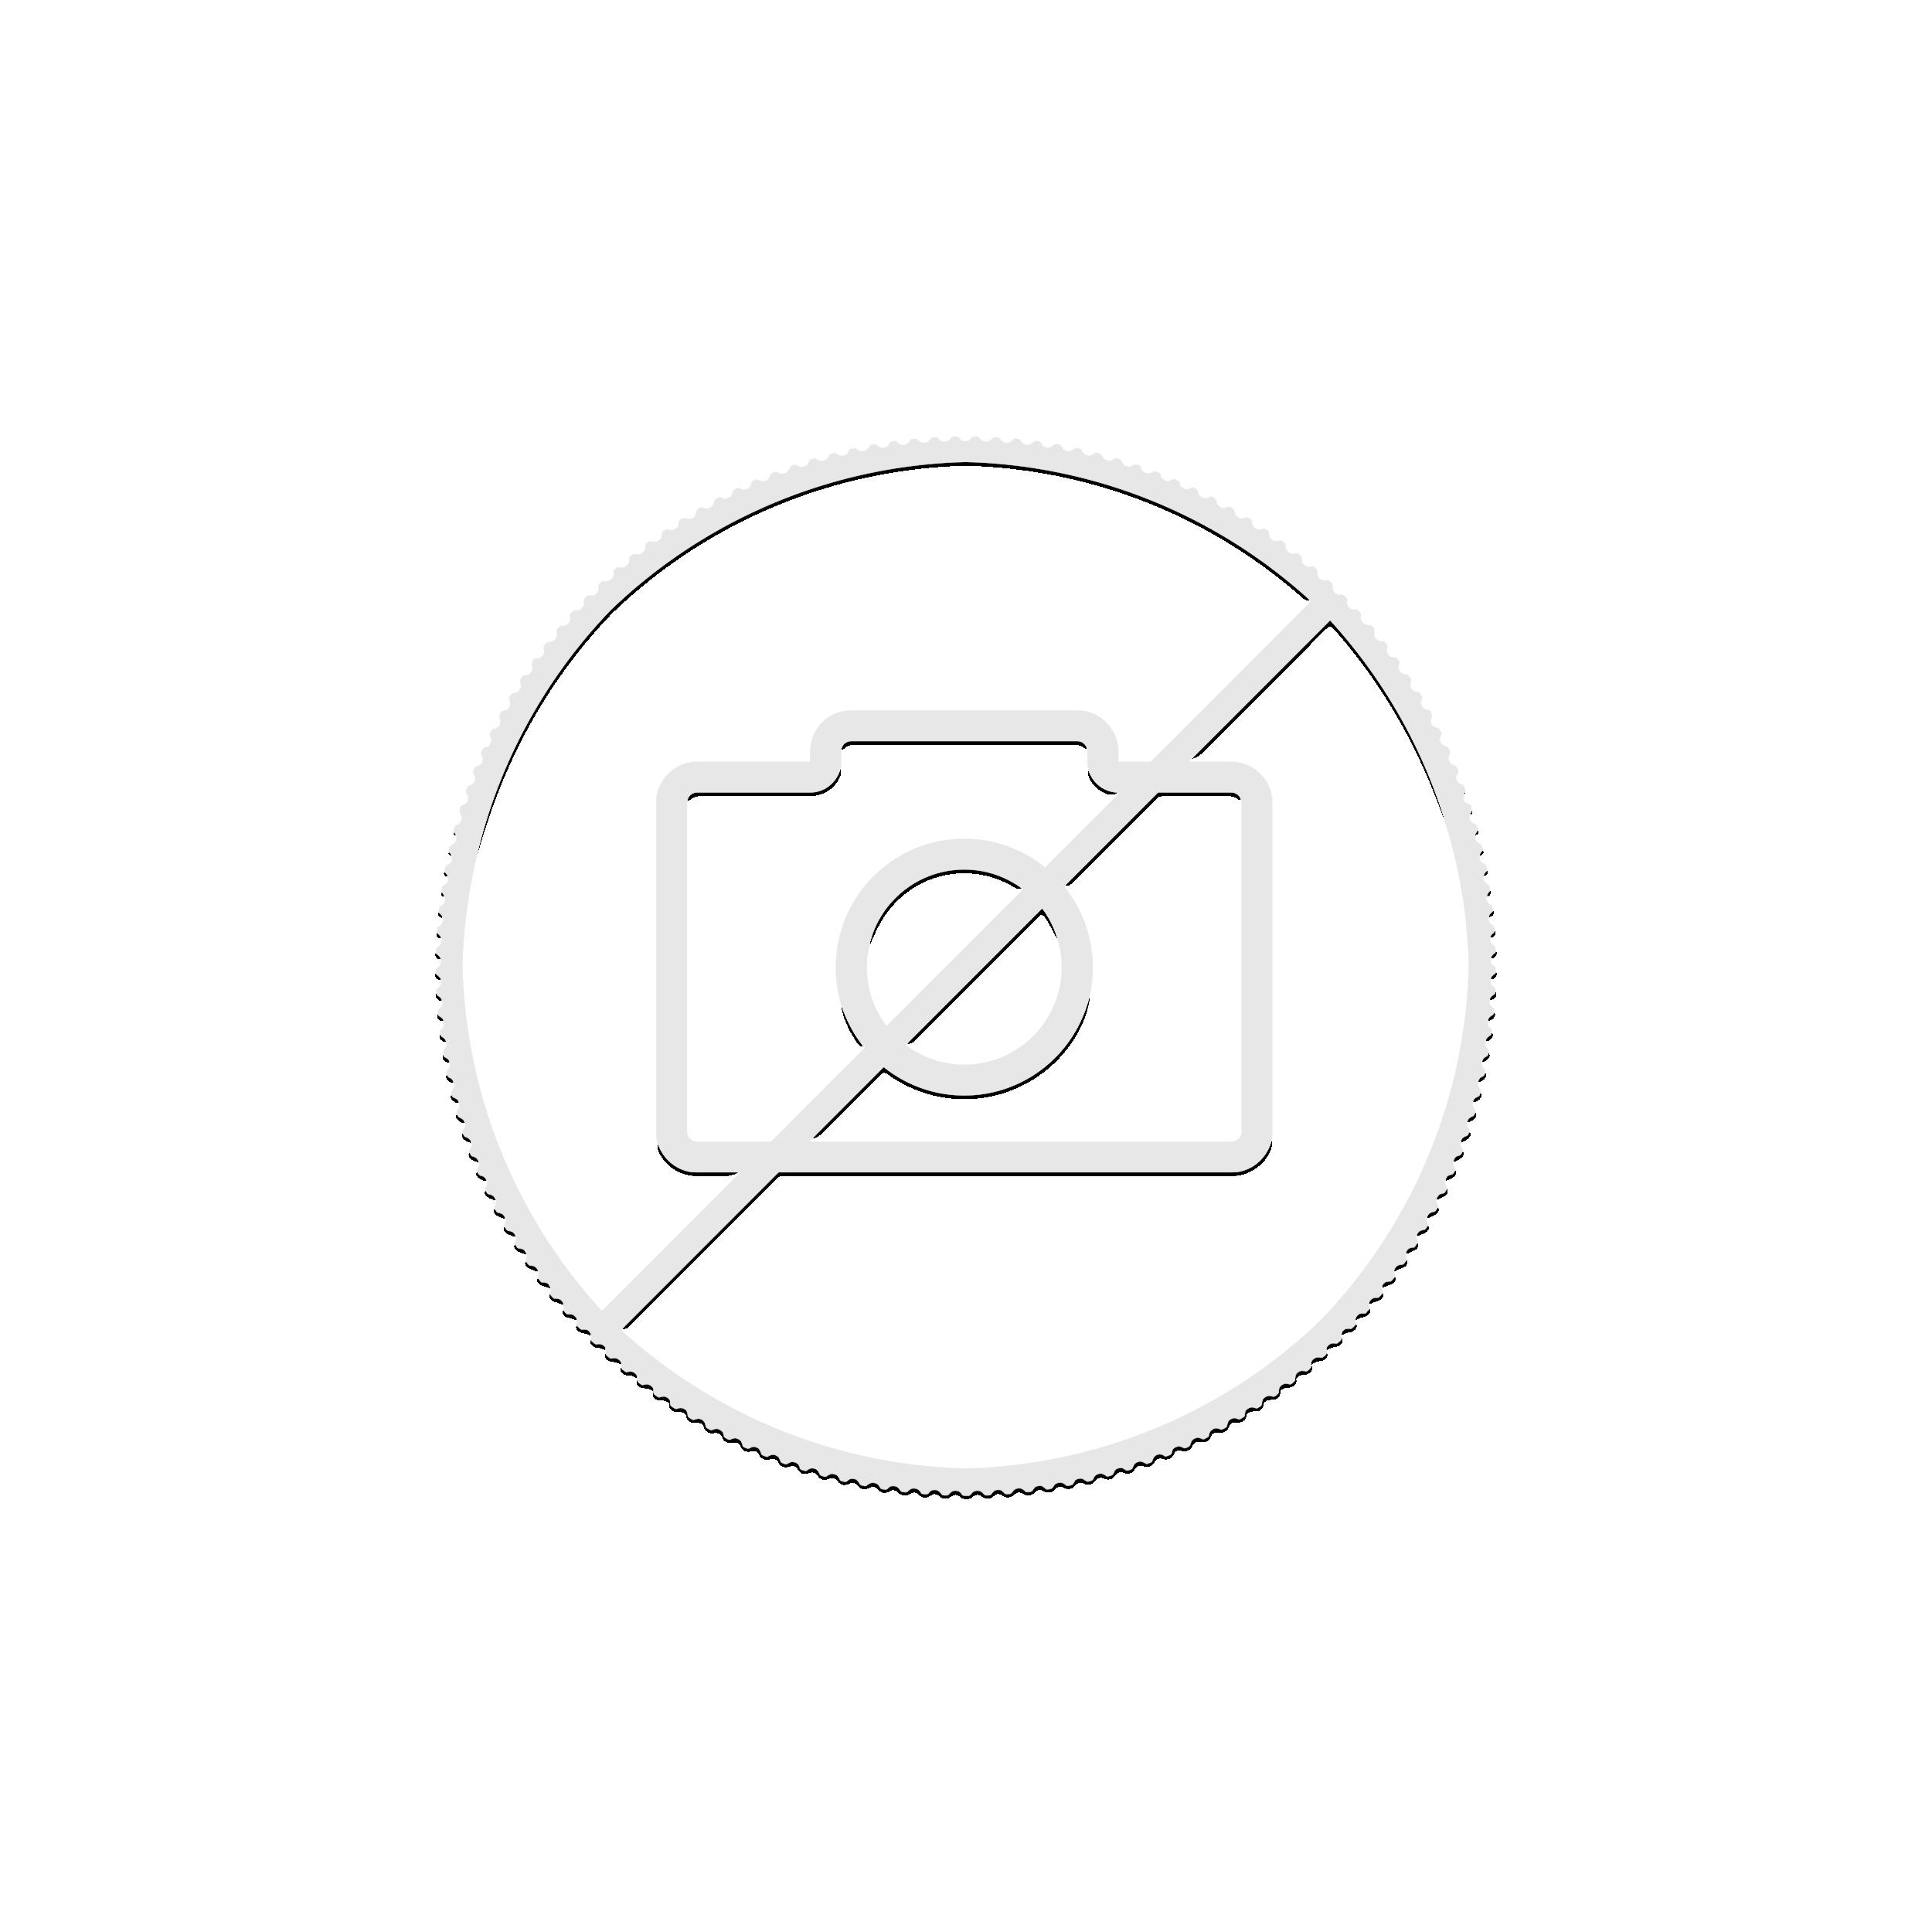 1 troy ounce zilveren munt Britannia 2021